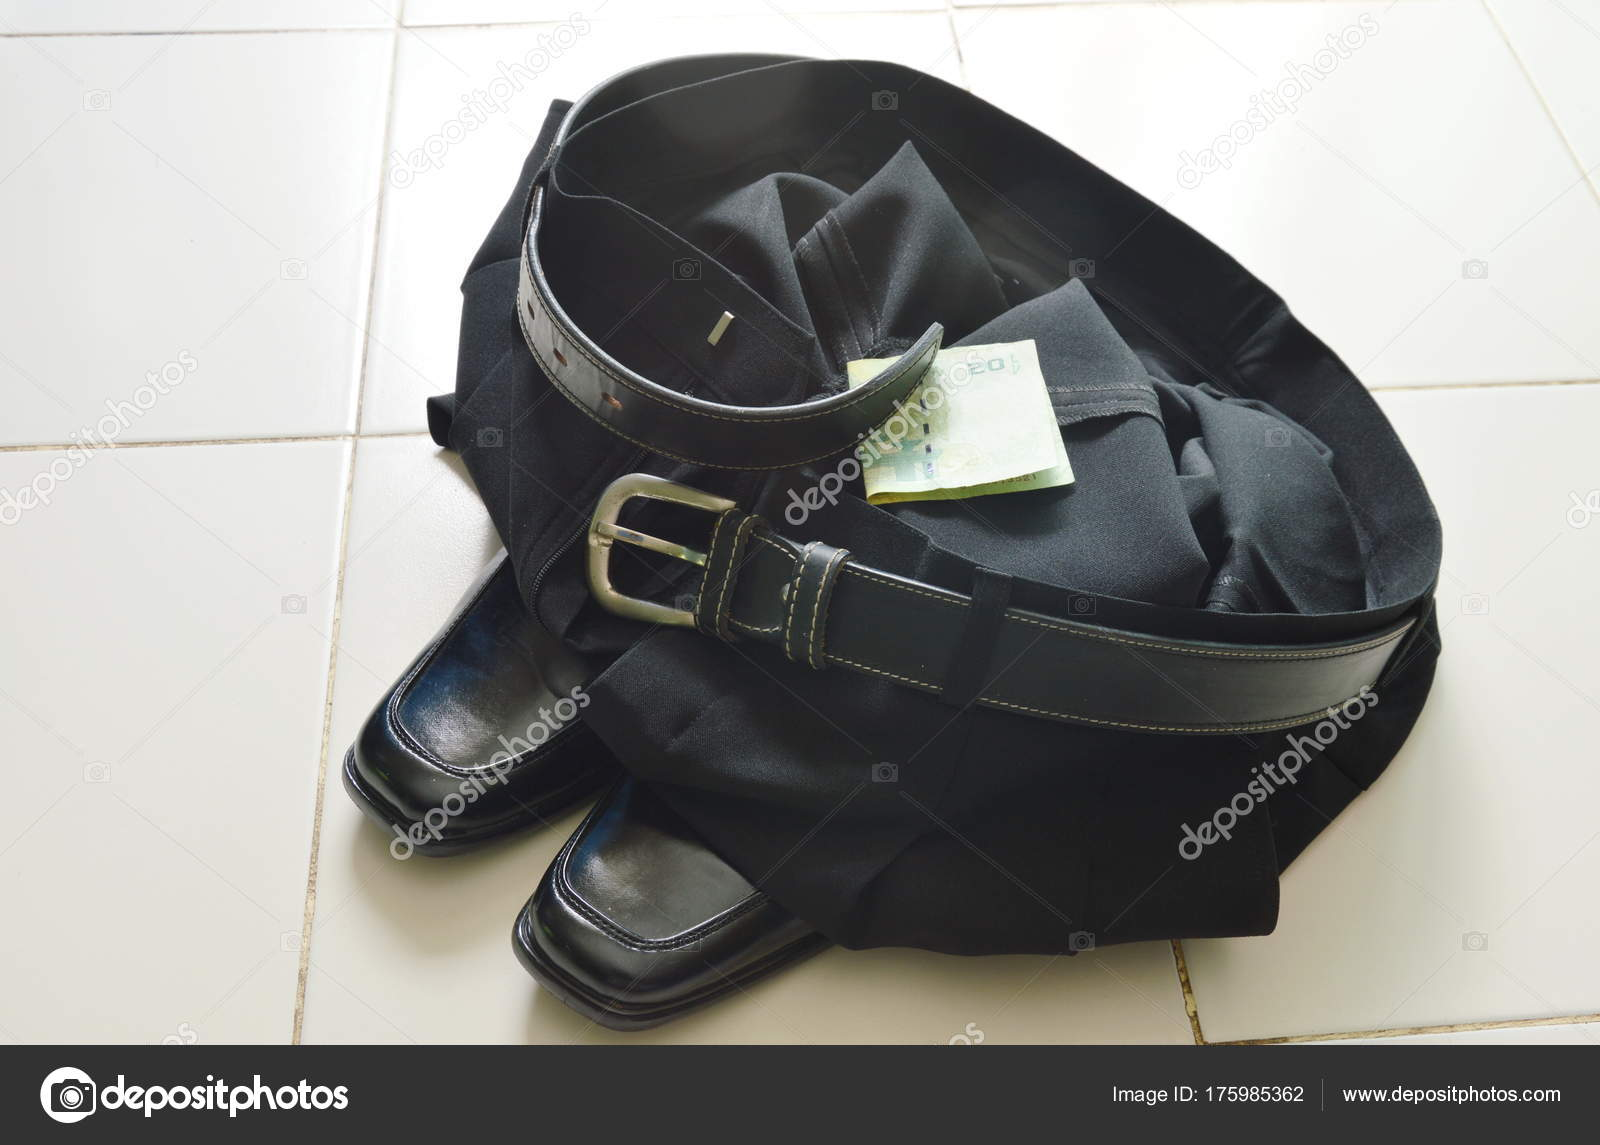 Banconota con bianco business pant e schiuma scarpa sul pavimento